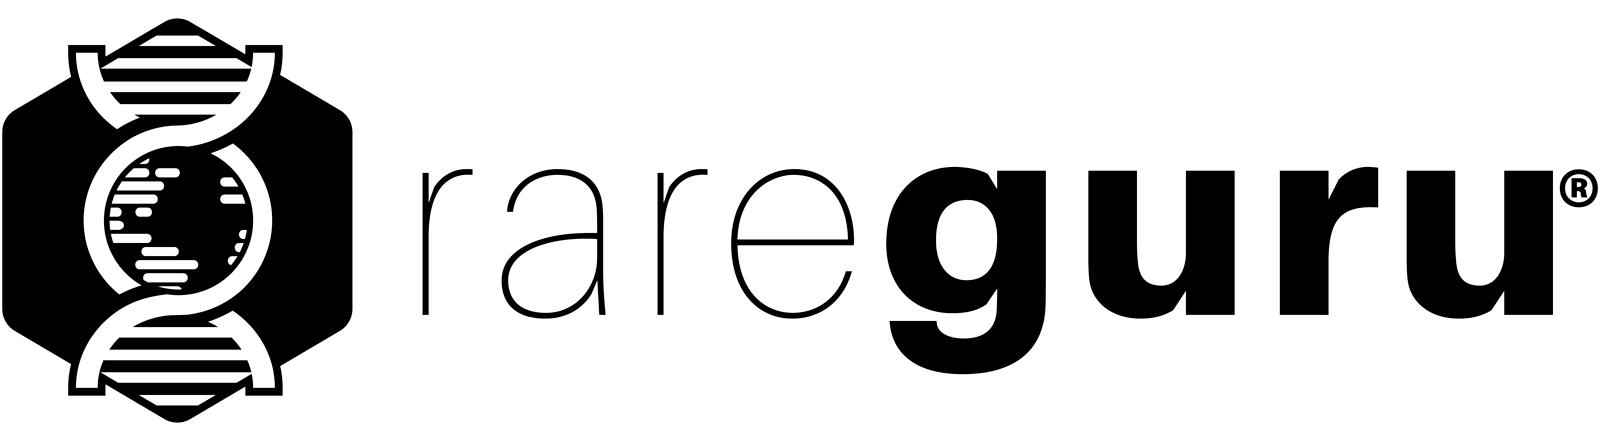 RareGuru Monochrome Black Logo